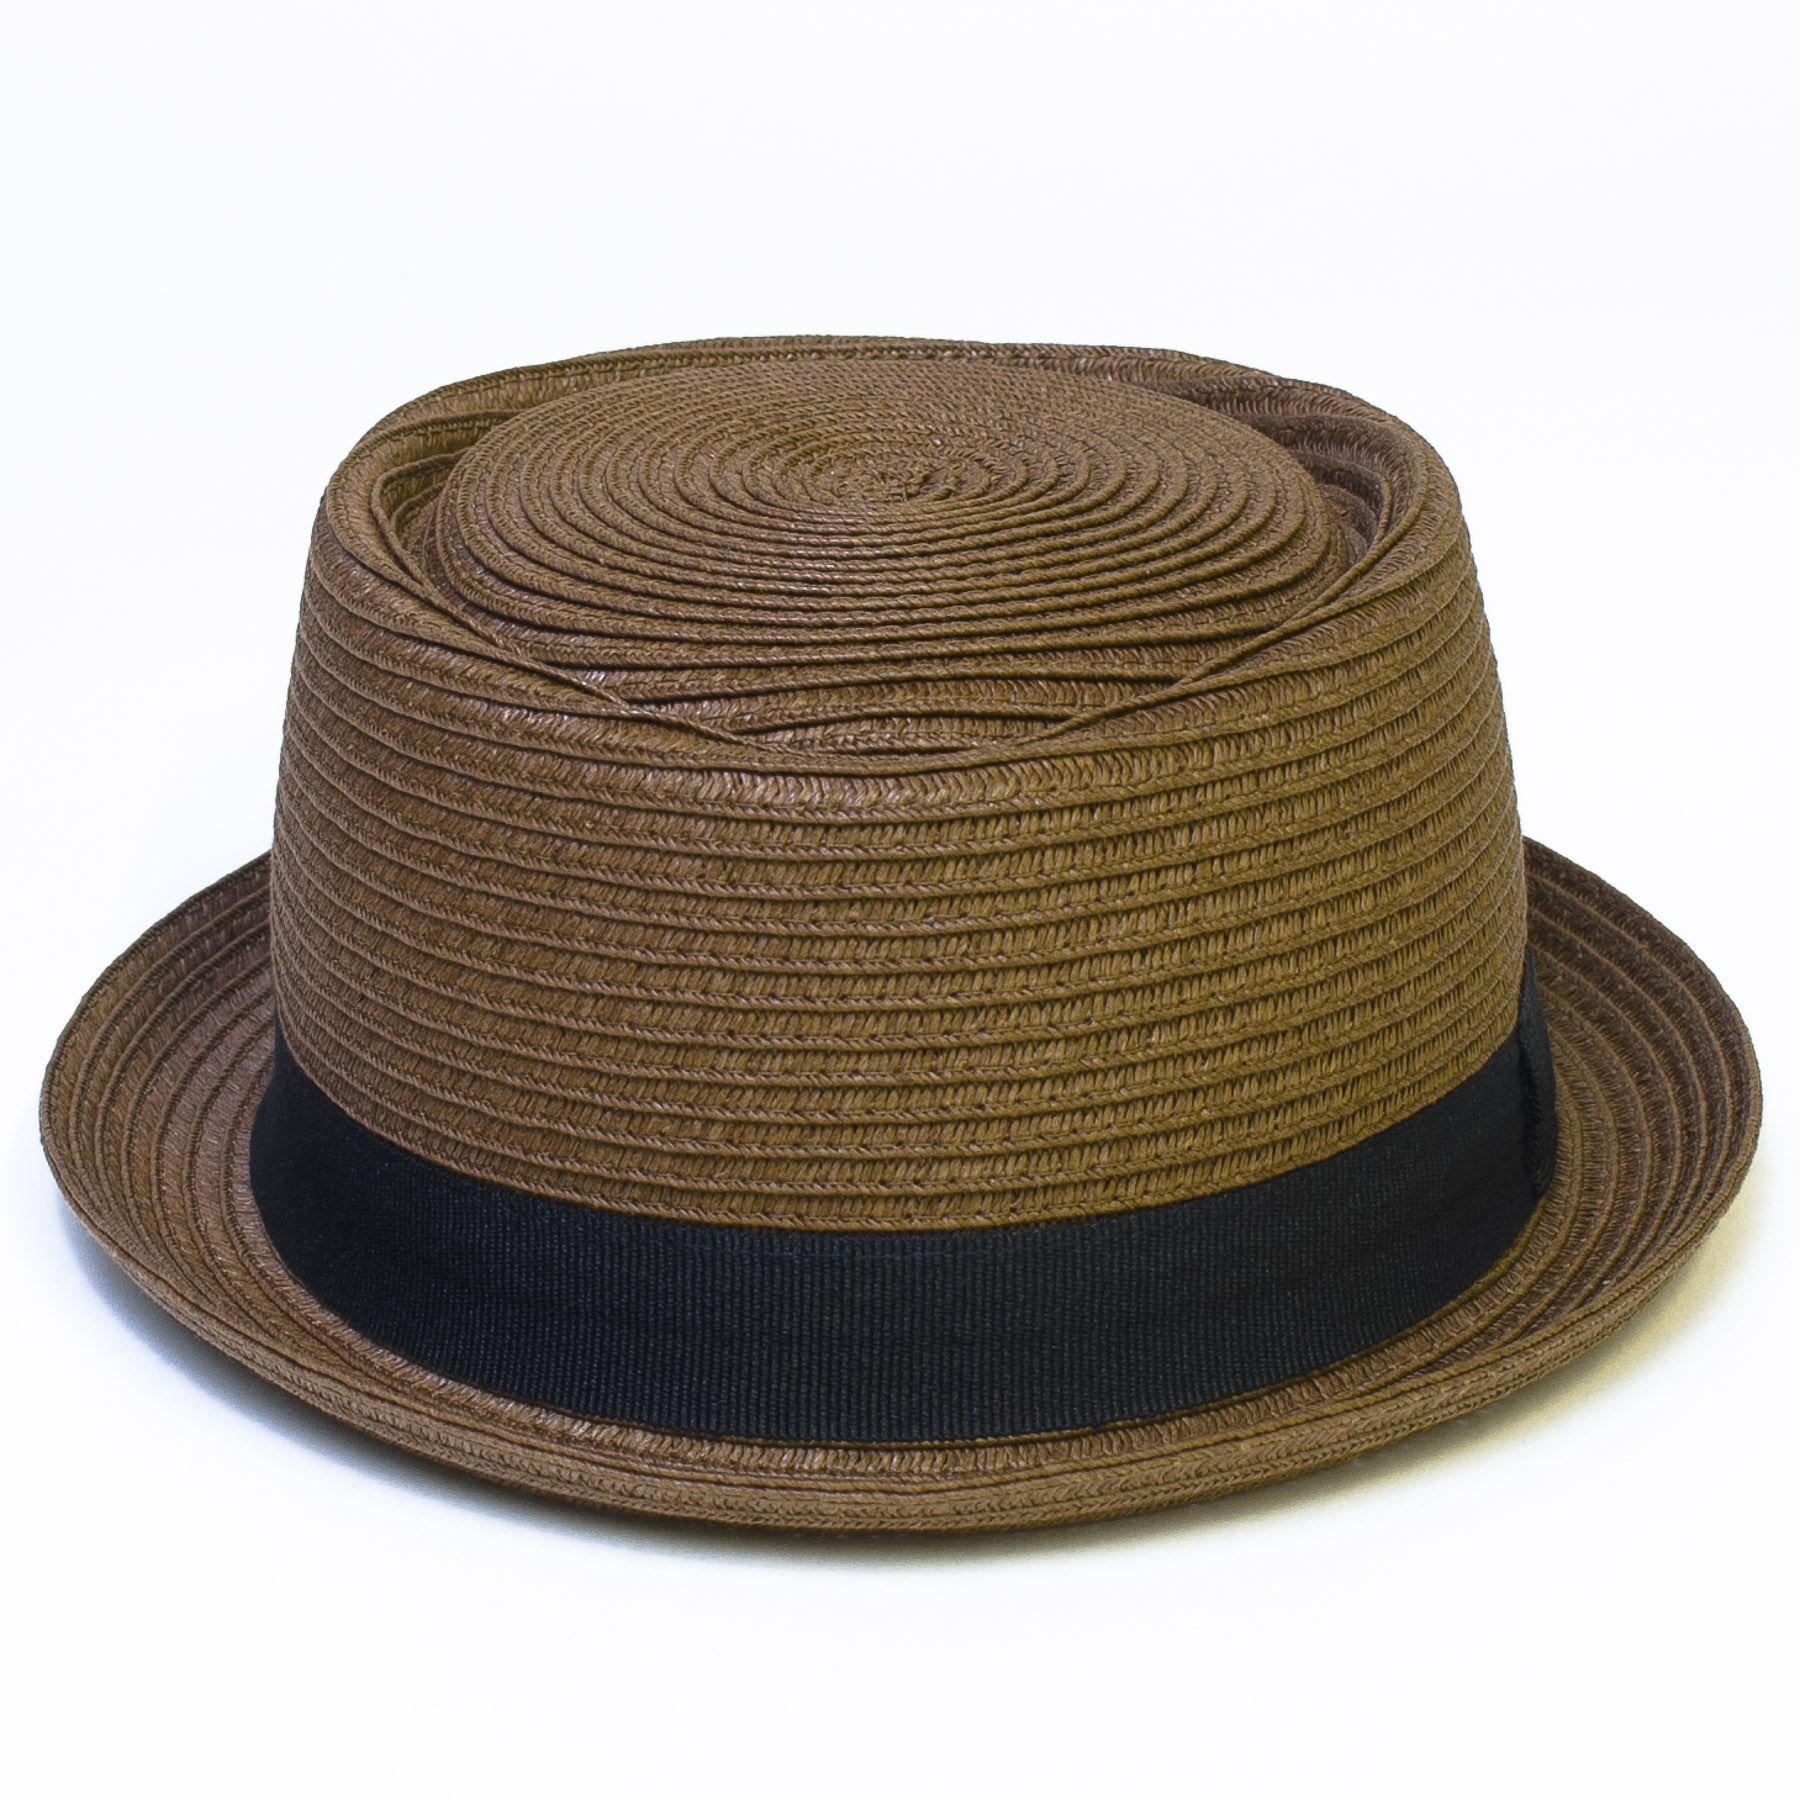 how to wear a pork pie hat